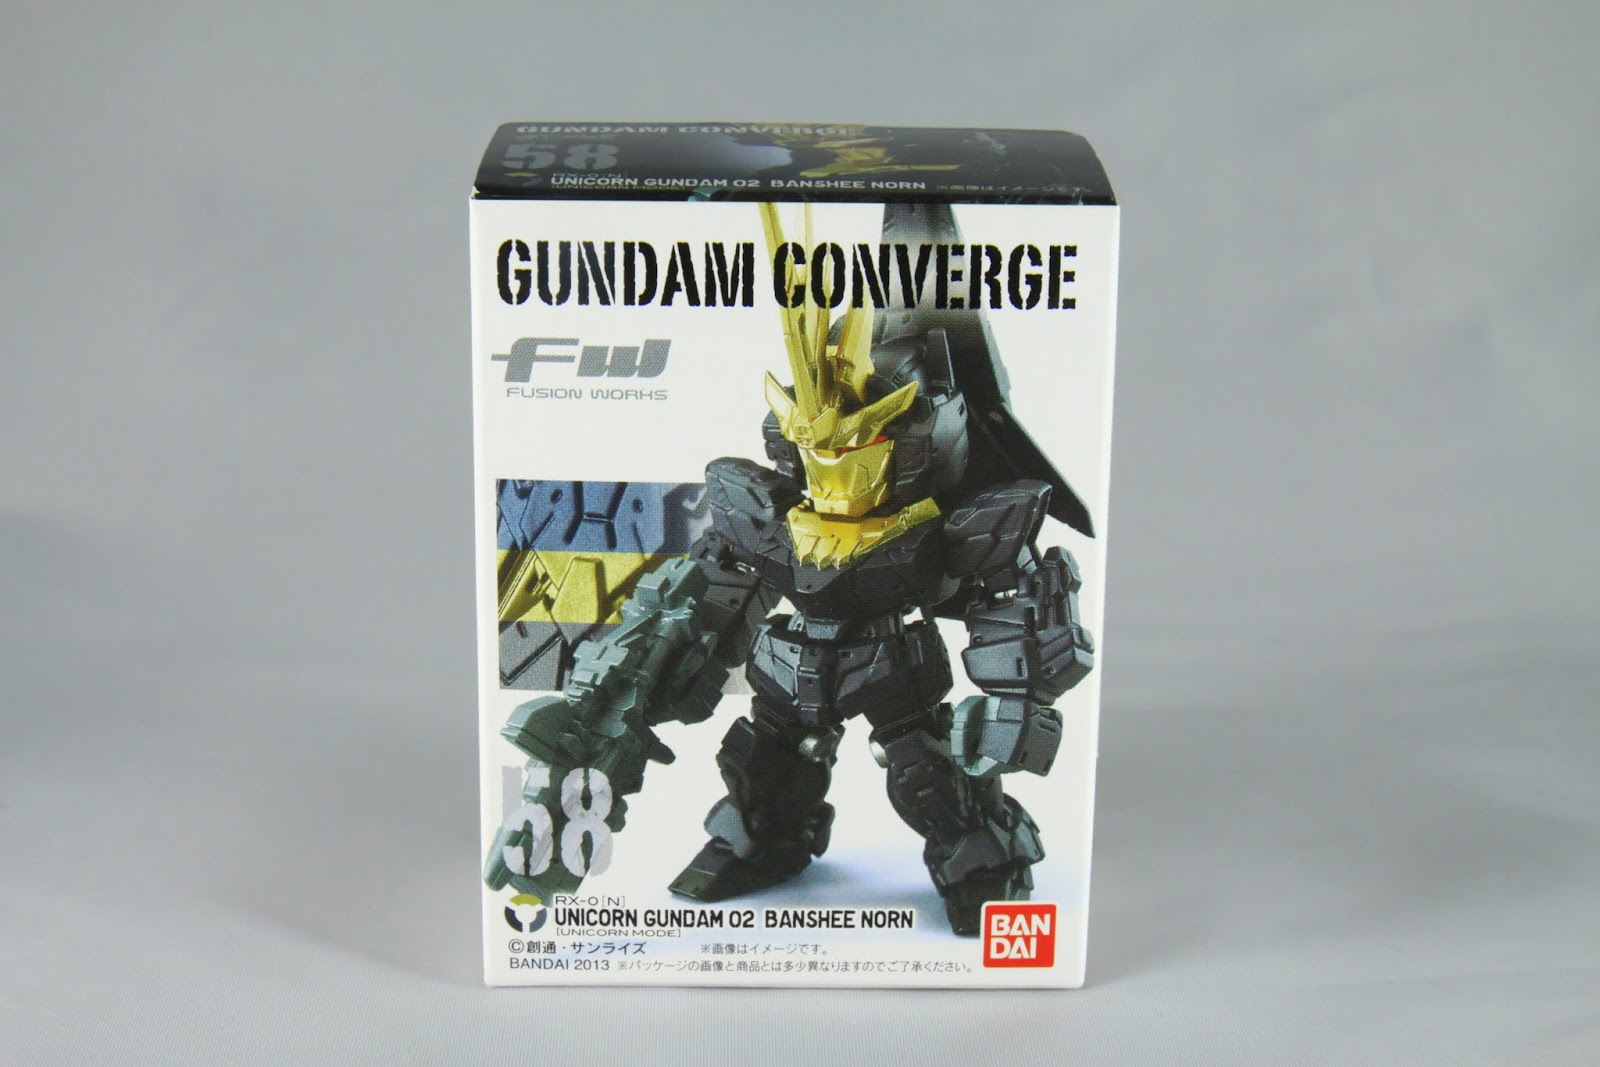 No.58 Unicorn Gundam 02 Banshee Norn